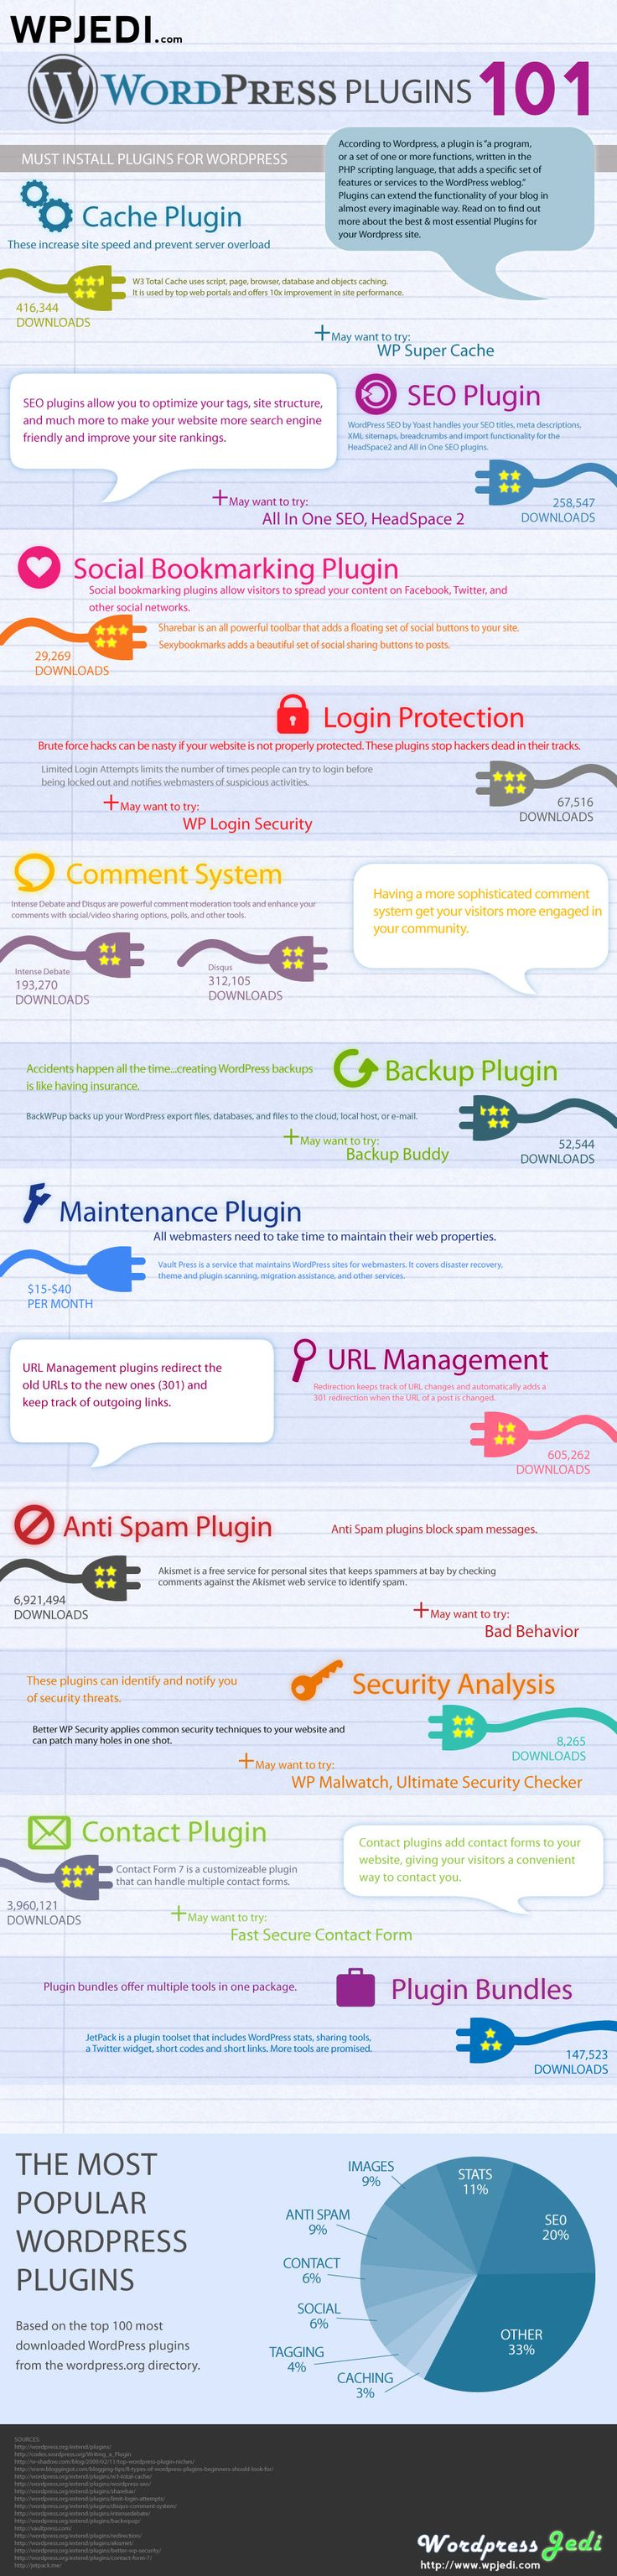 http://hellomarketingco.com Awesome list of essential Wordpress plugins